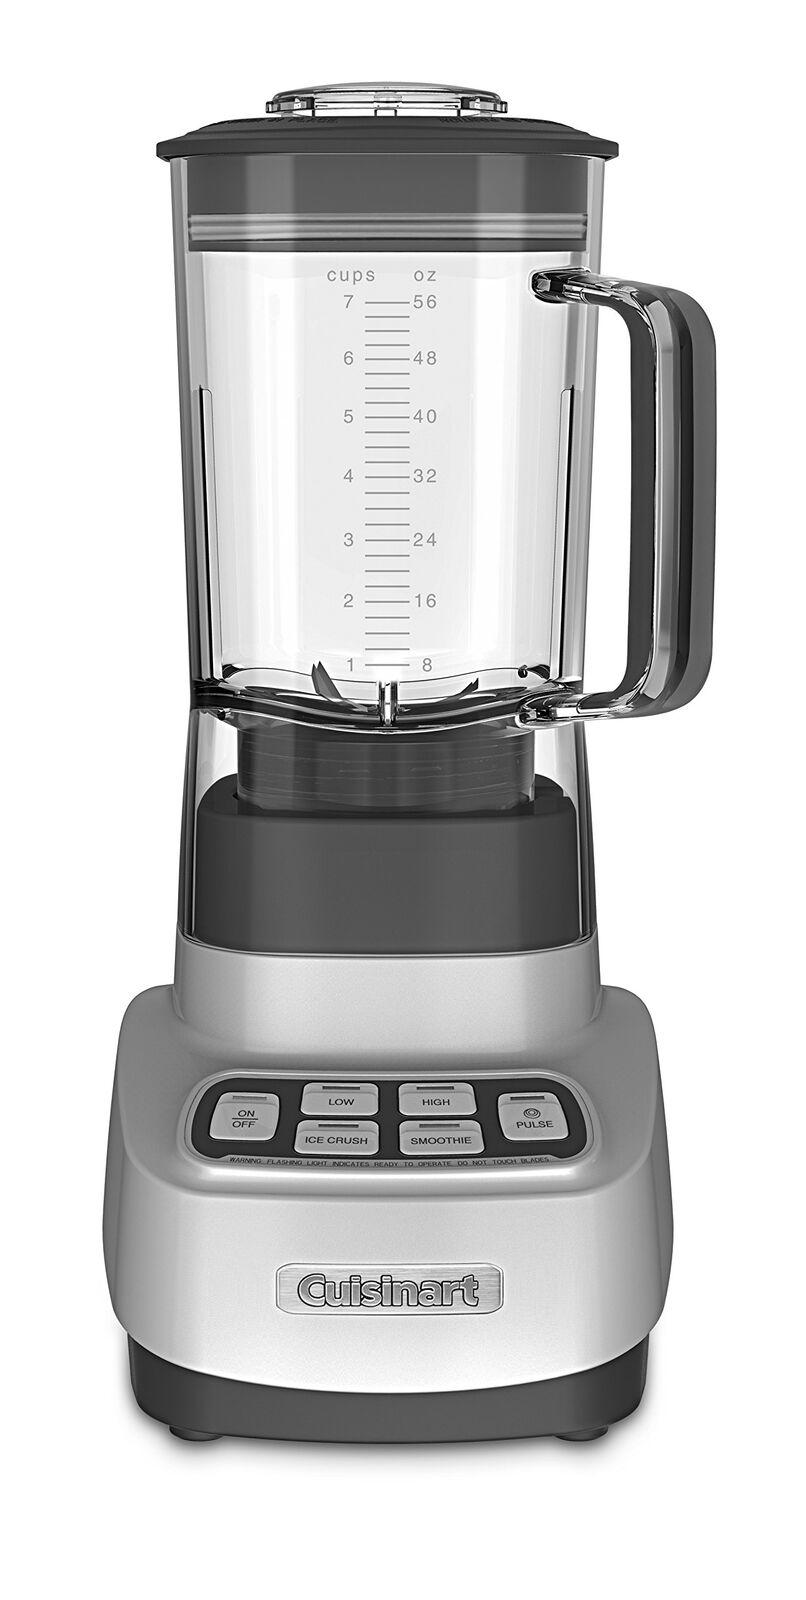 Cuisinart Velocity Ultra 7.5 1-hp Blender - 650 W - 1.75 qt-argent brossé